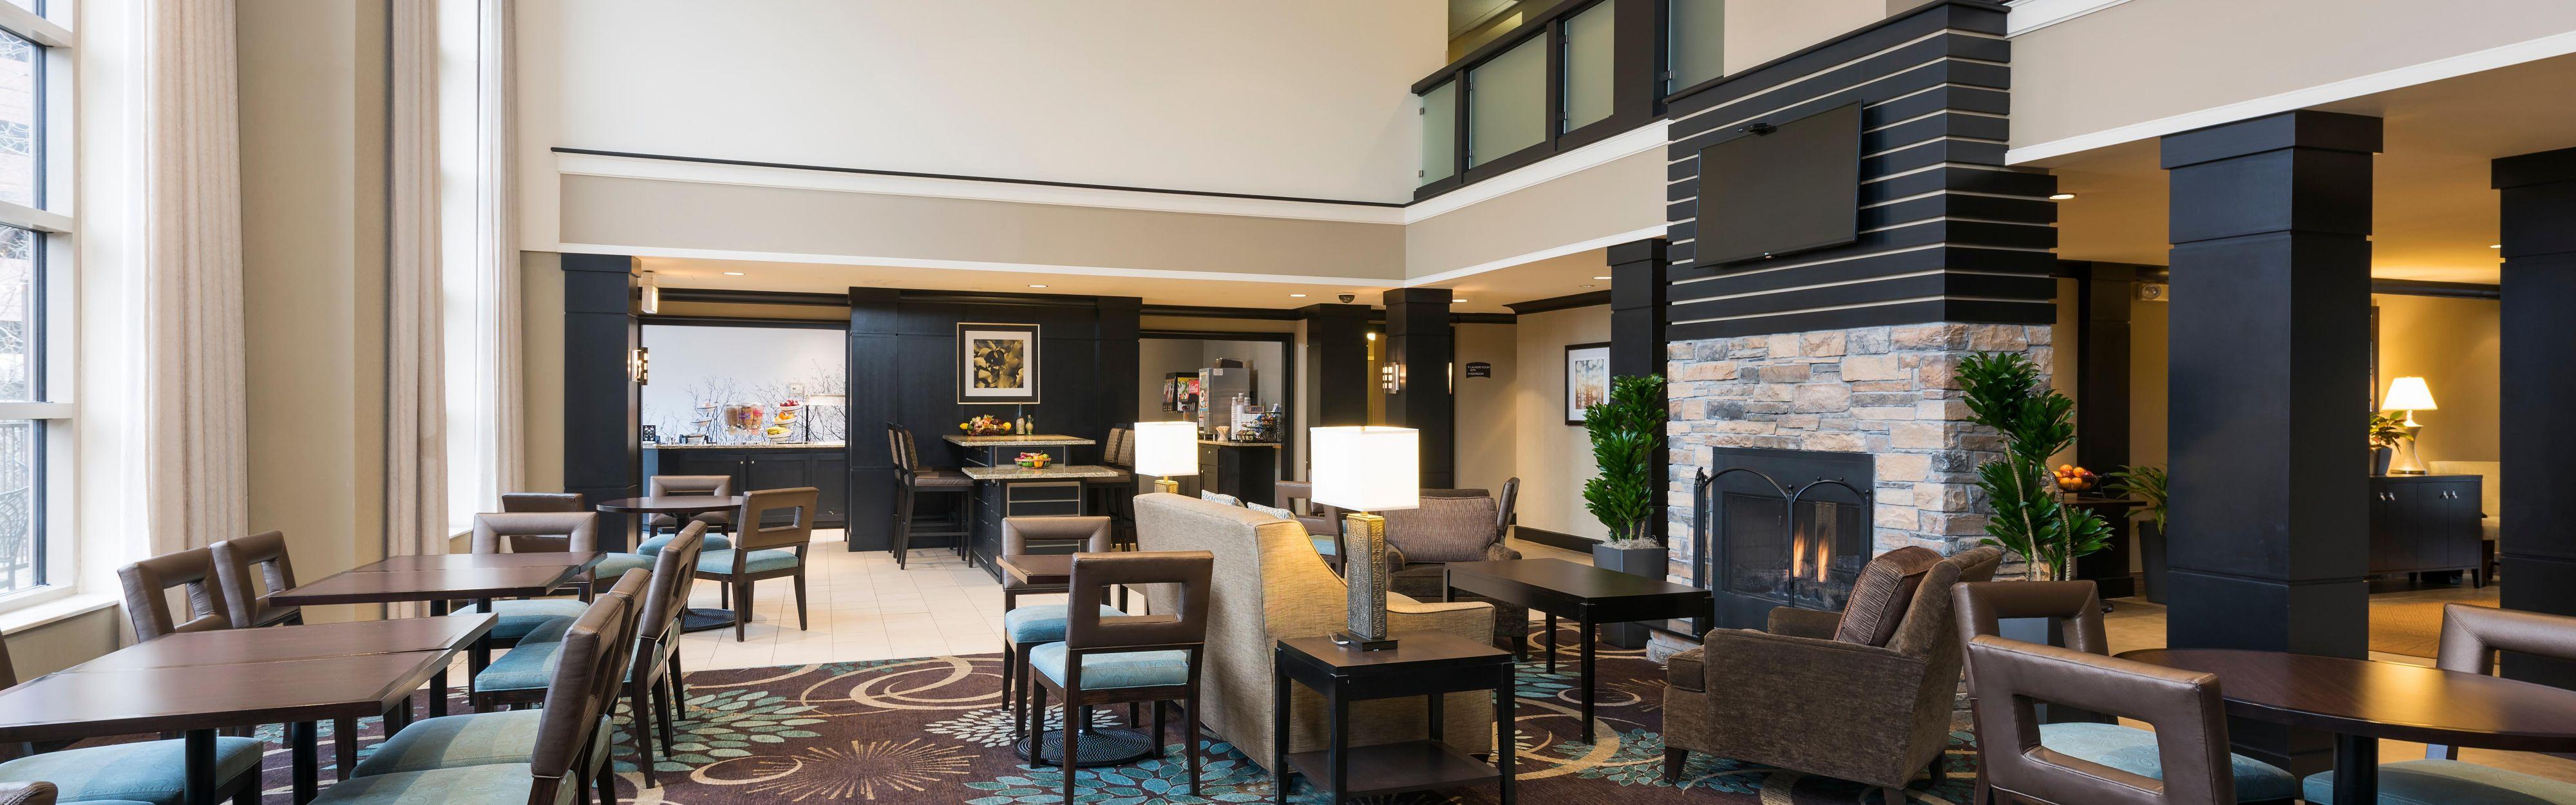 Staybridge Suites Chicago-Oakbrook Terrace image 3